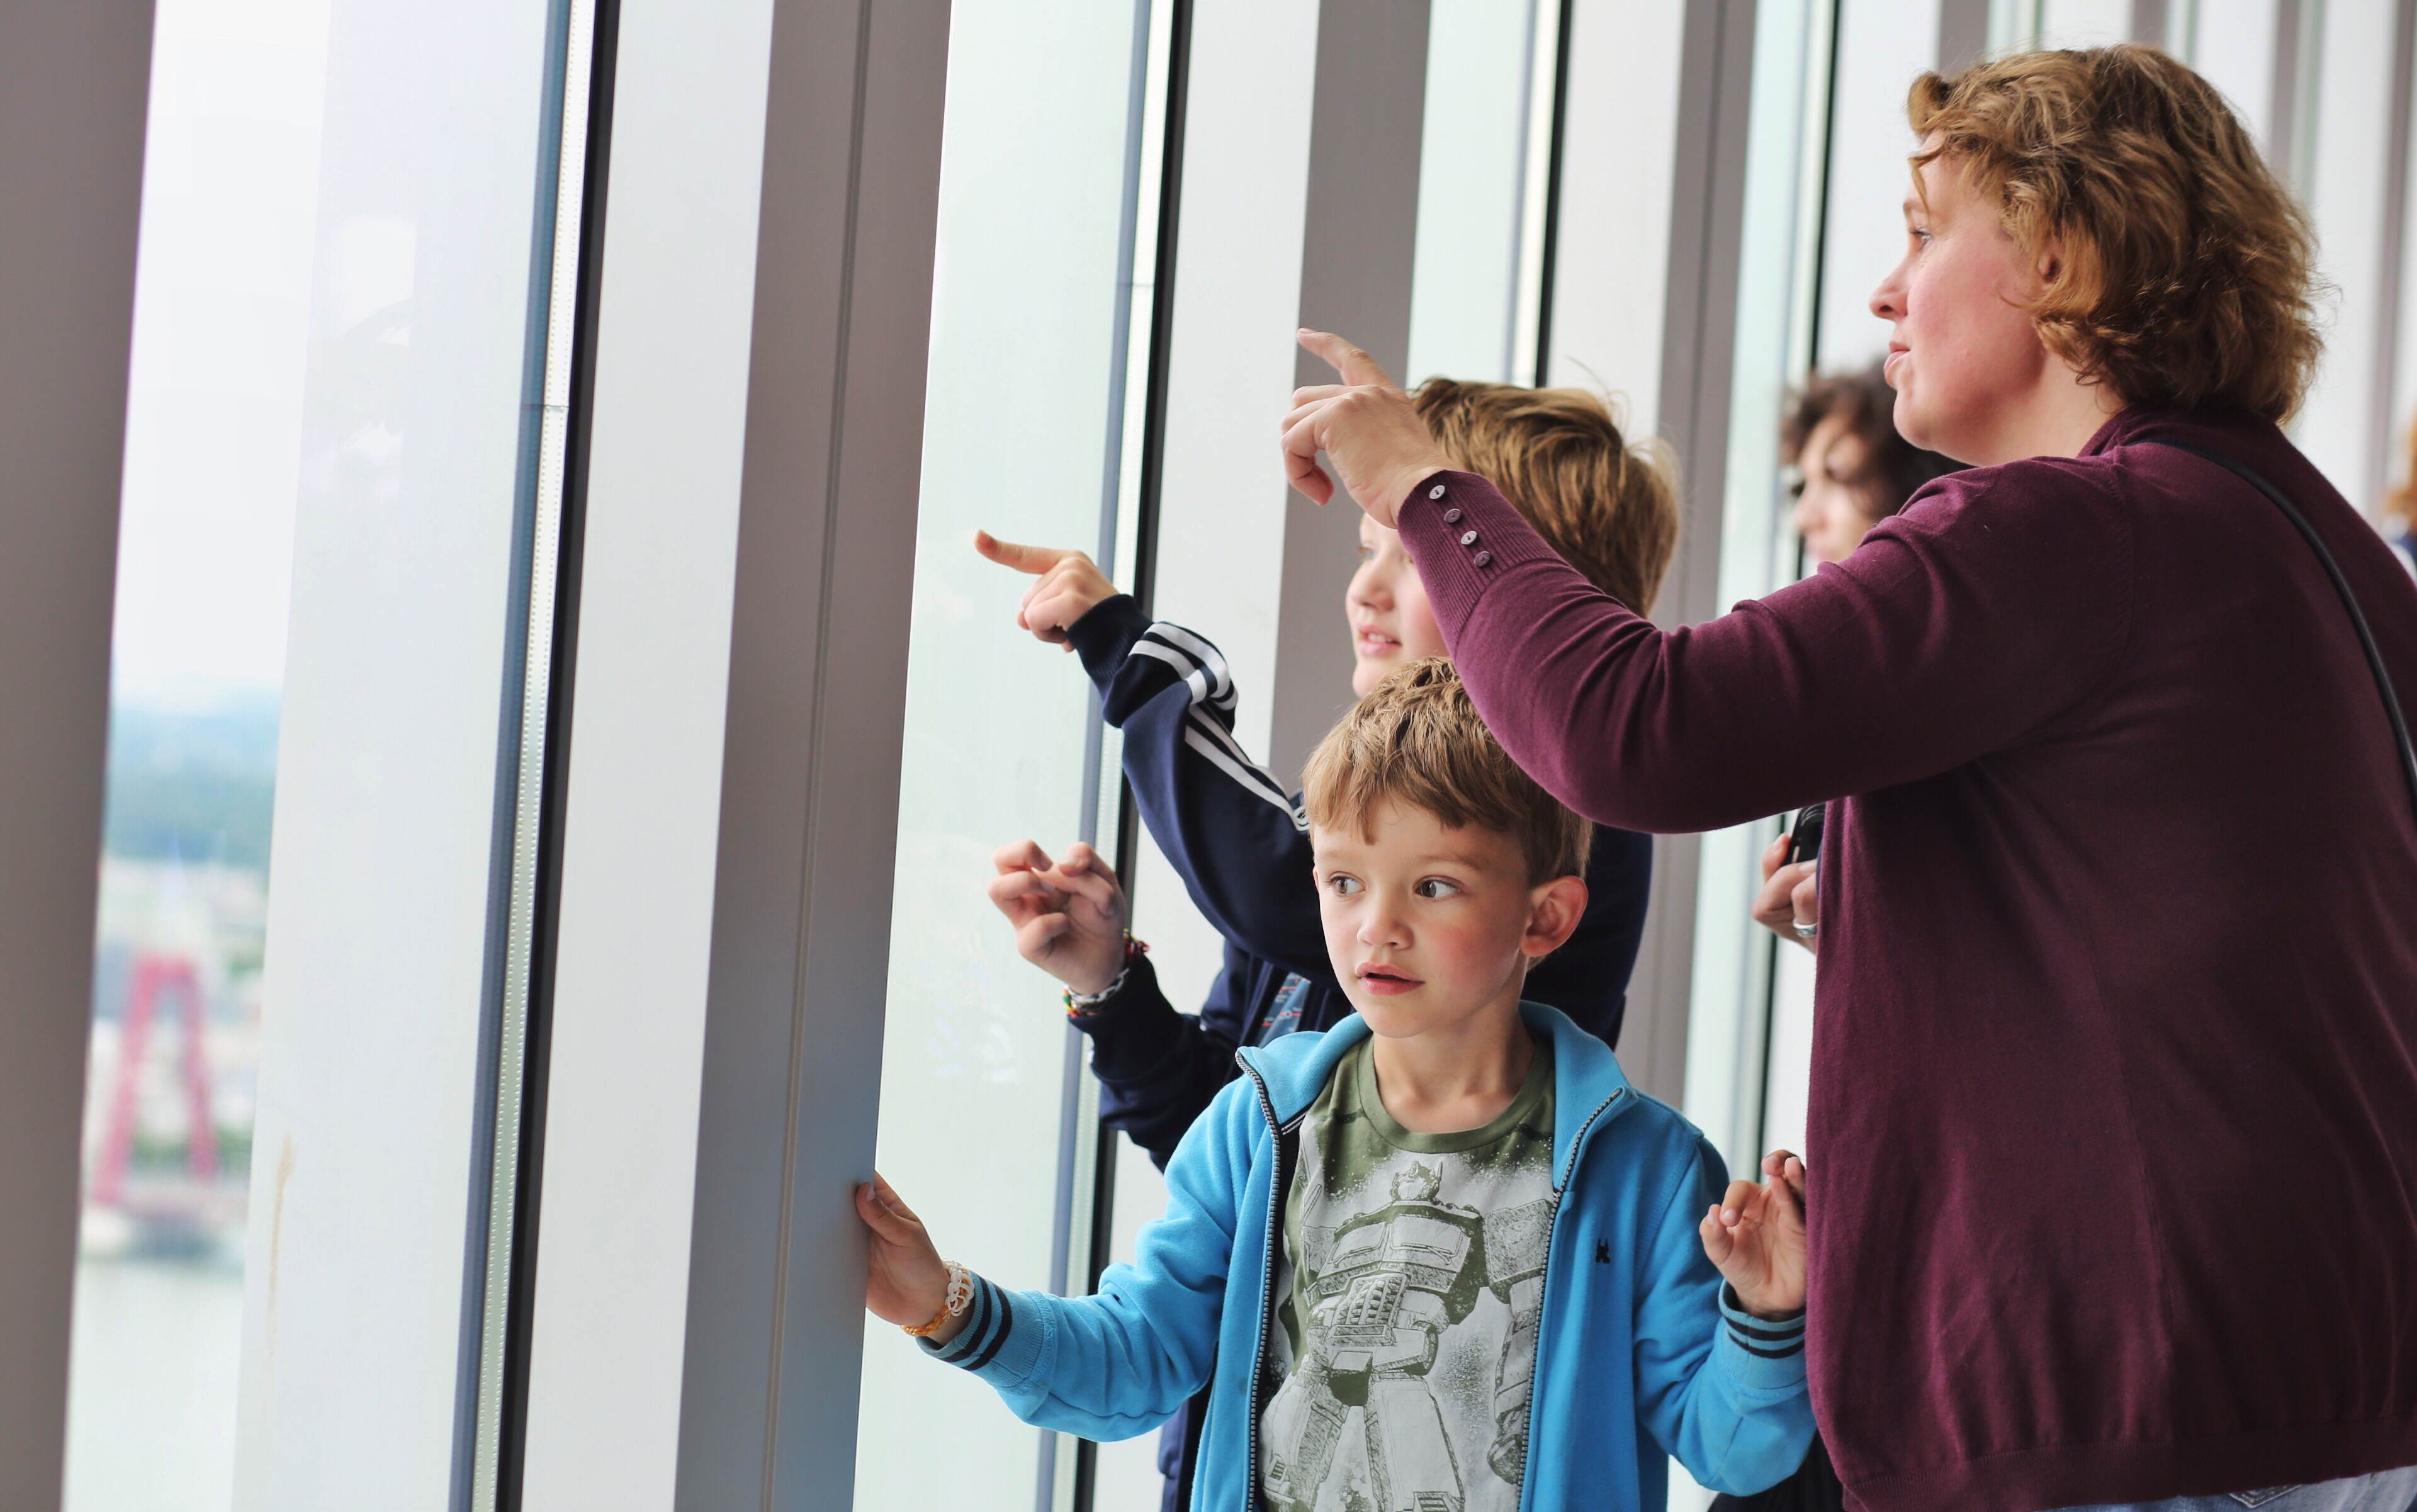 Rotterdam offici le opening van de luchtsingel for Fred rotterdam